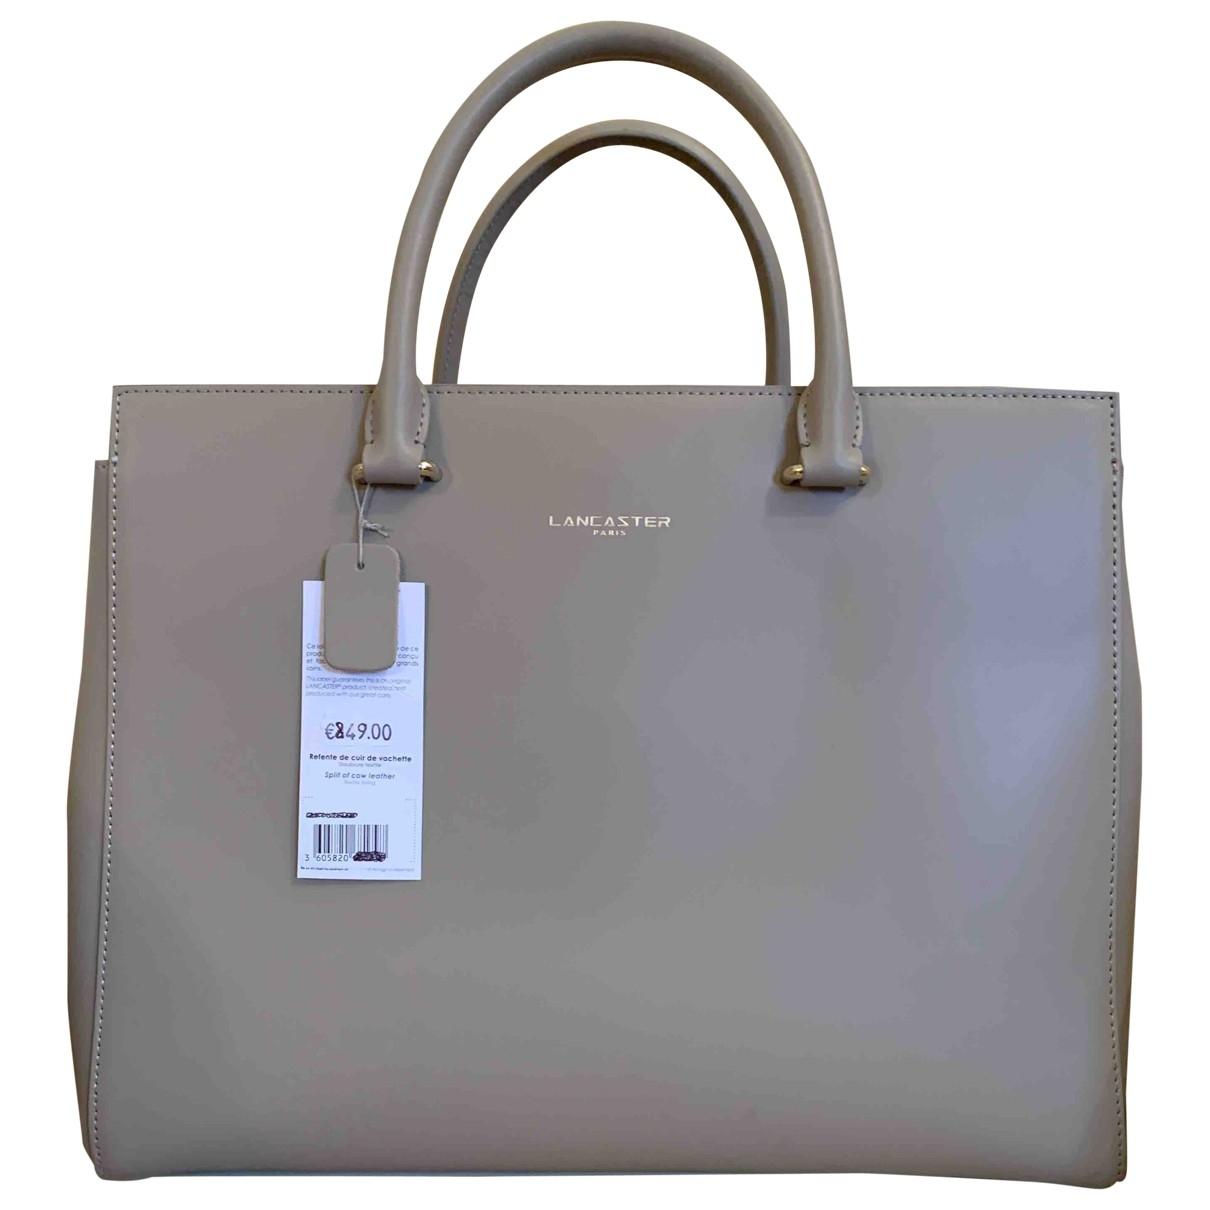 Lancaster \N Beige Leather handbag for Women \N